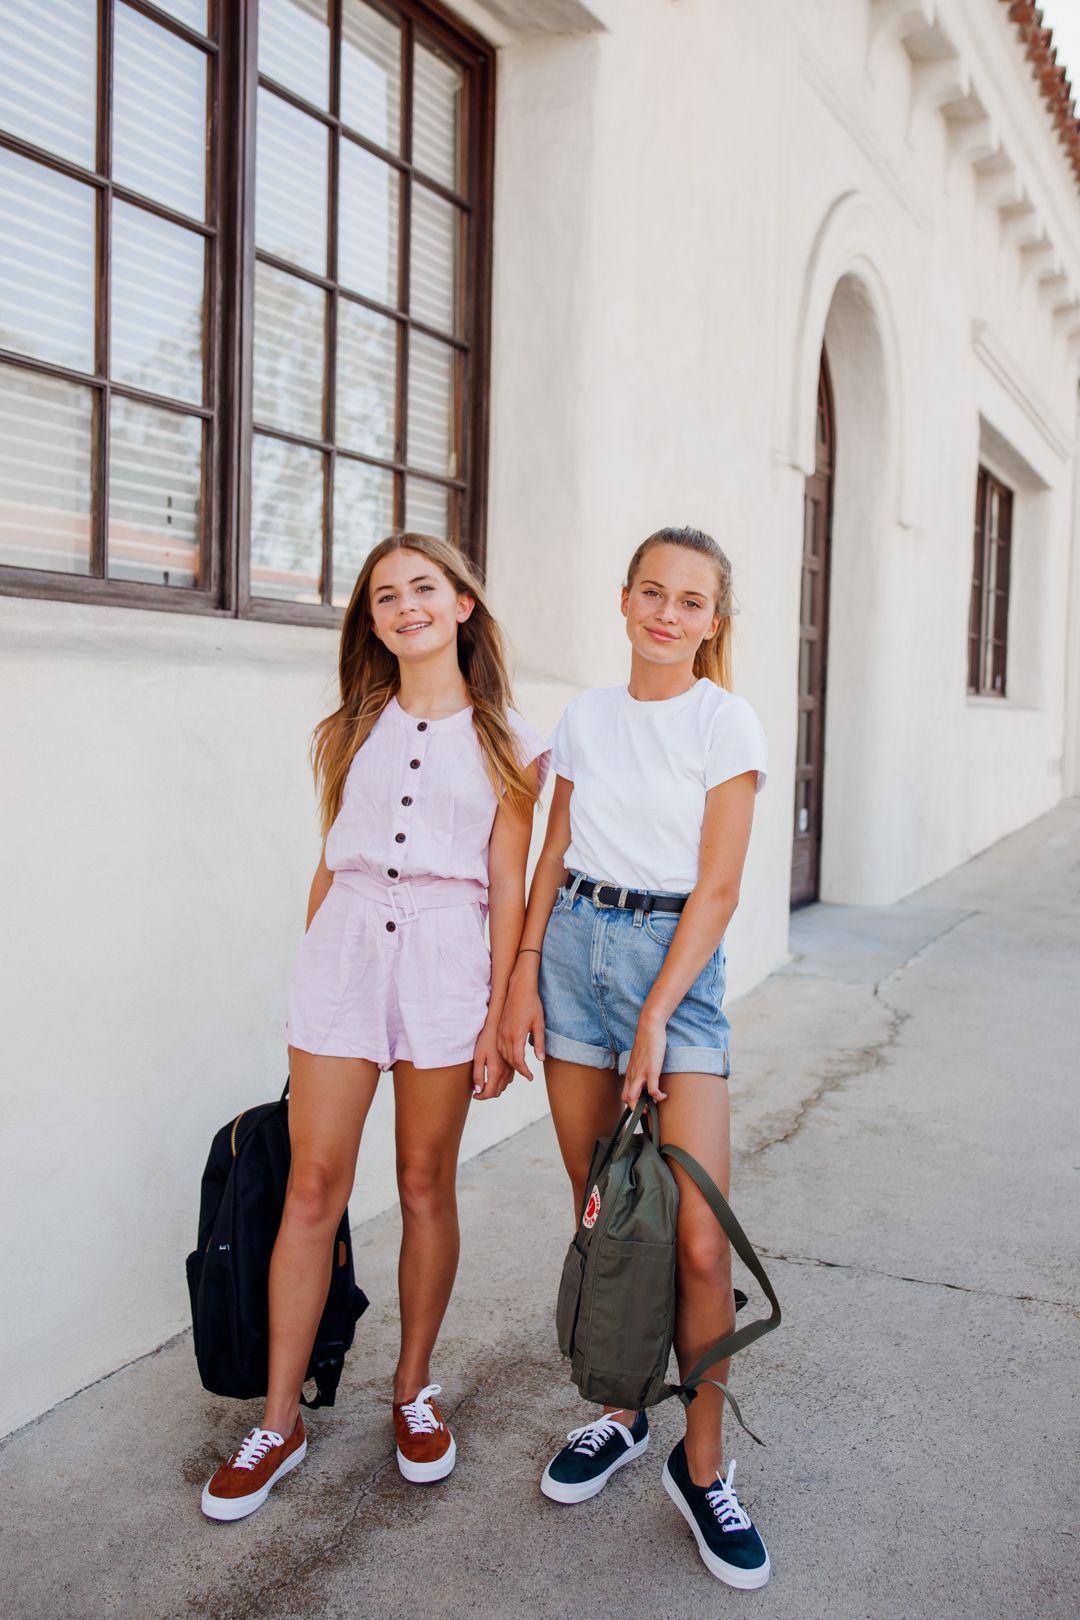 Jordan anal back to school for teen girls porn real